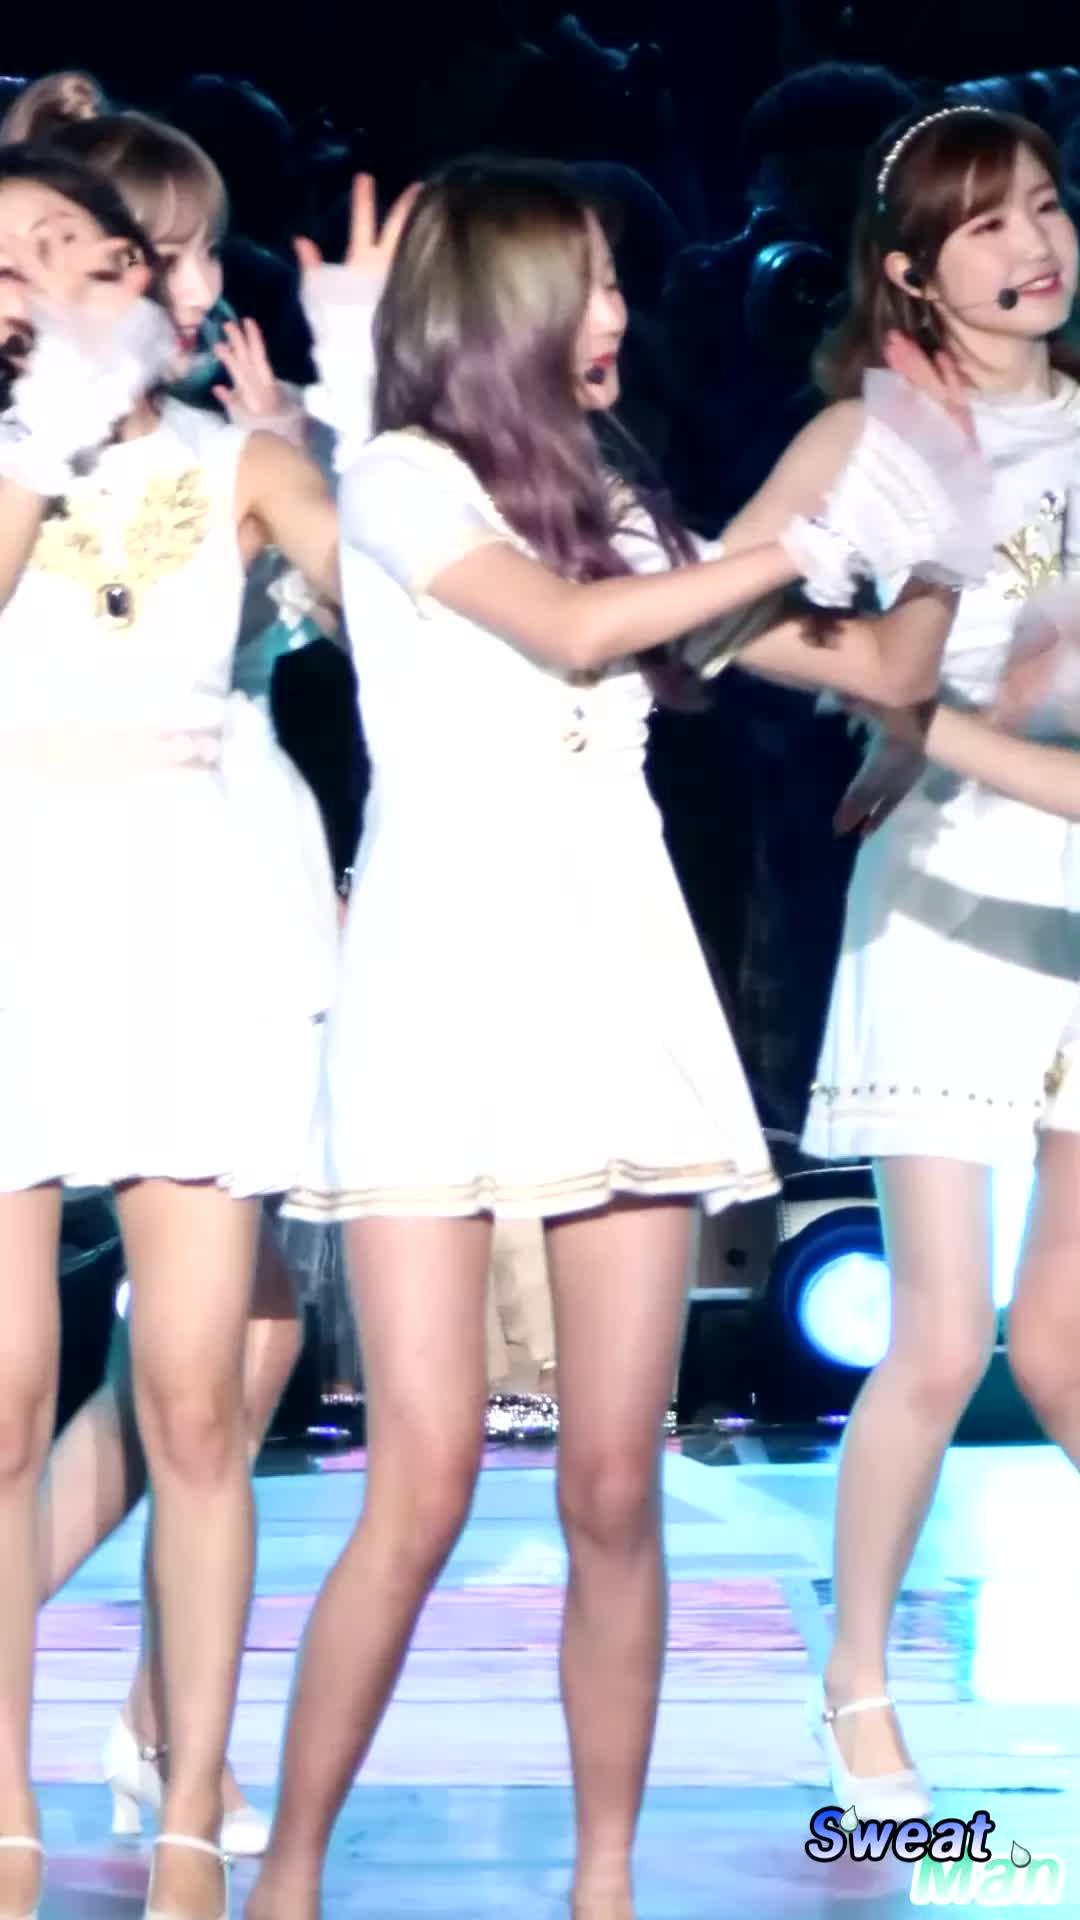 iz*one, izone, kpop, wonyoung, 190428 아이즈원(IZ ONE) 장원영(Jang Wonyoung) - 하늘위로(UP) @광주 Super Concert 직캠(FANCAM) BY 땀맨(SweatMan) GIFs